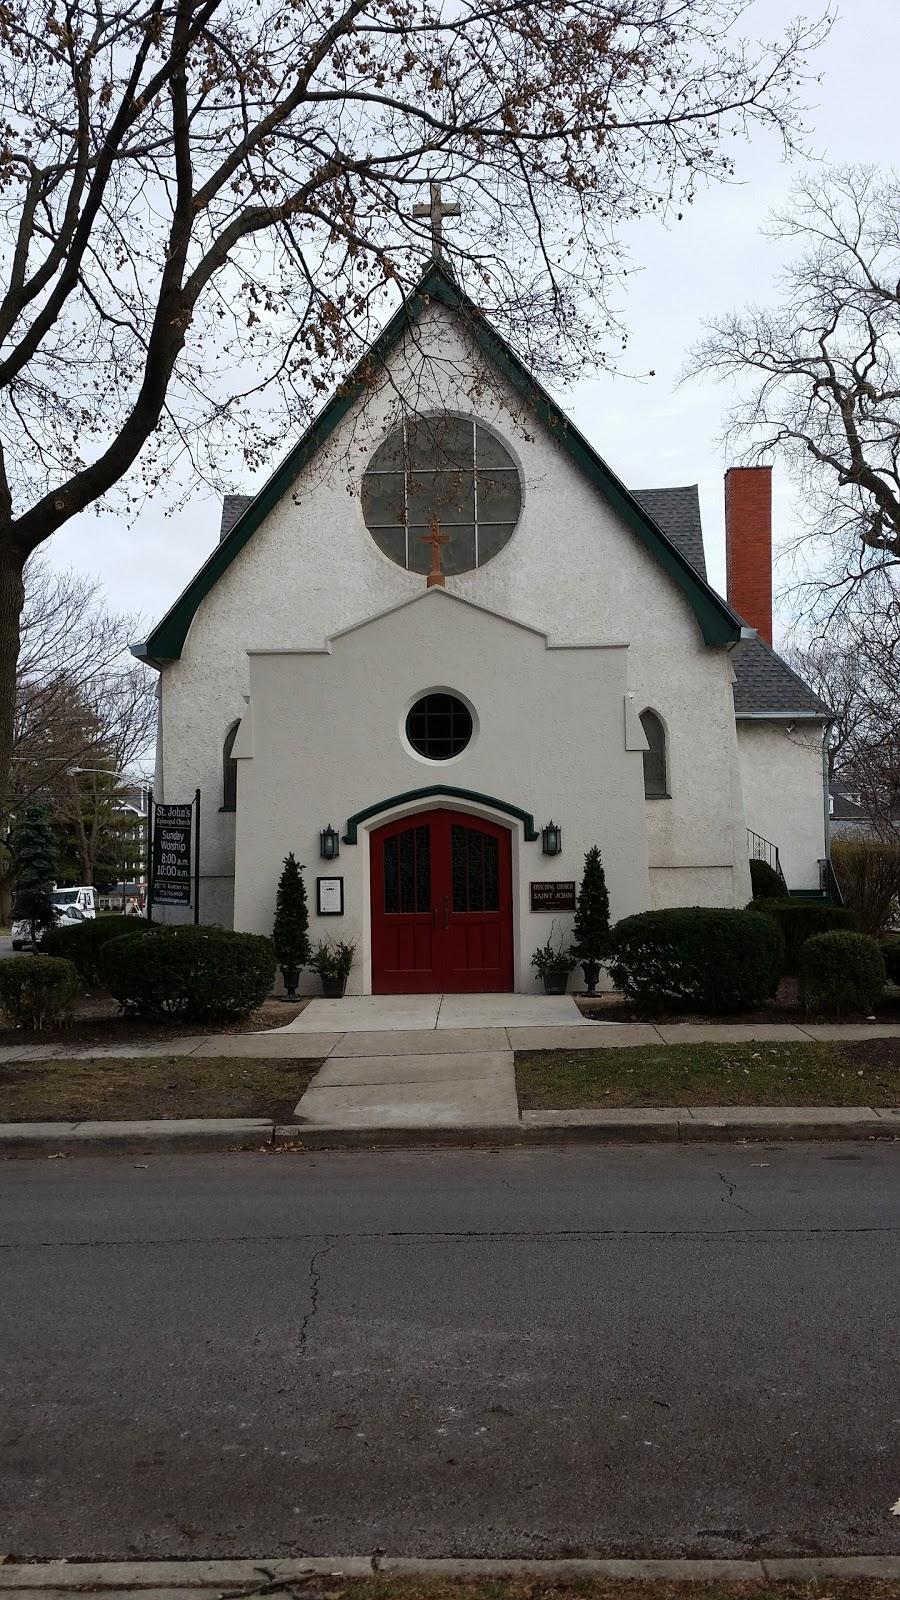 St Johns Episcopal Church - church    Photo 3 of 10   Address: 3857 N Kostner Ave, Chicago, IL 60641, USA   Phone: (773) 725-9026